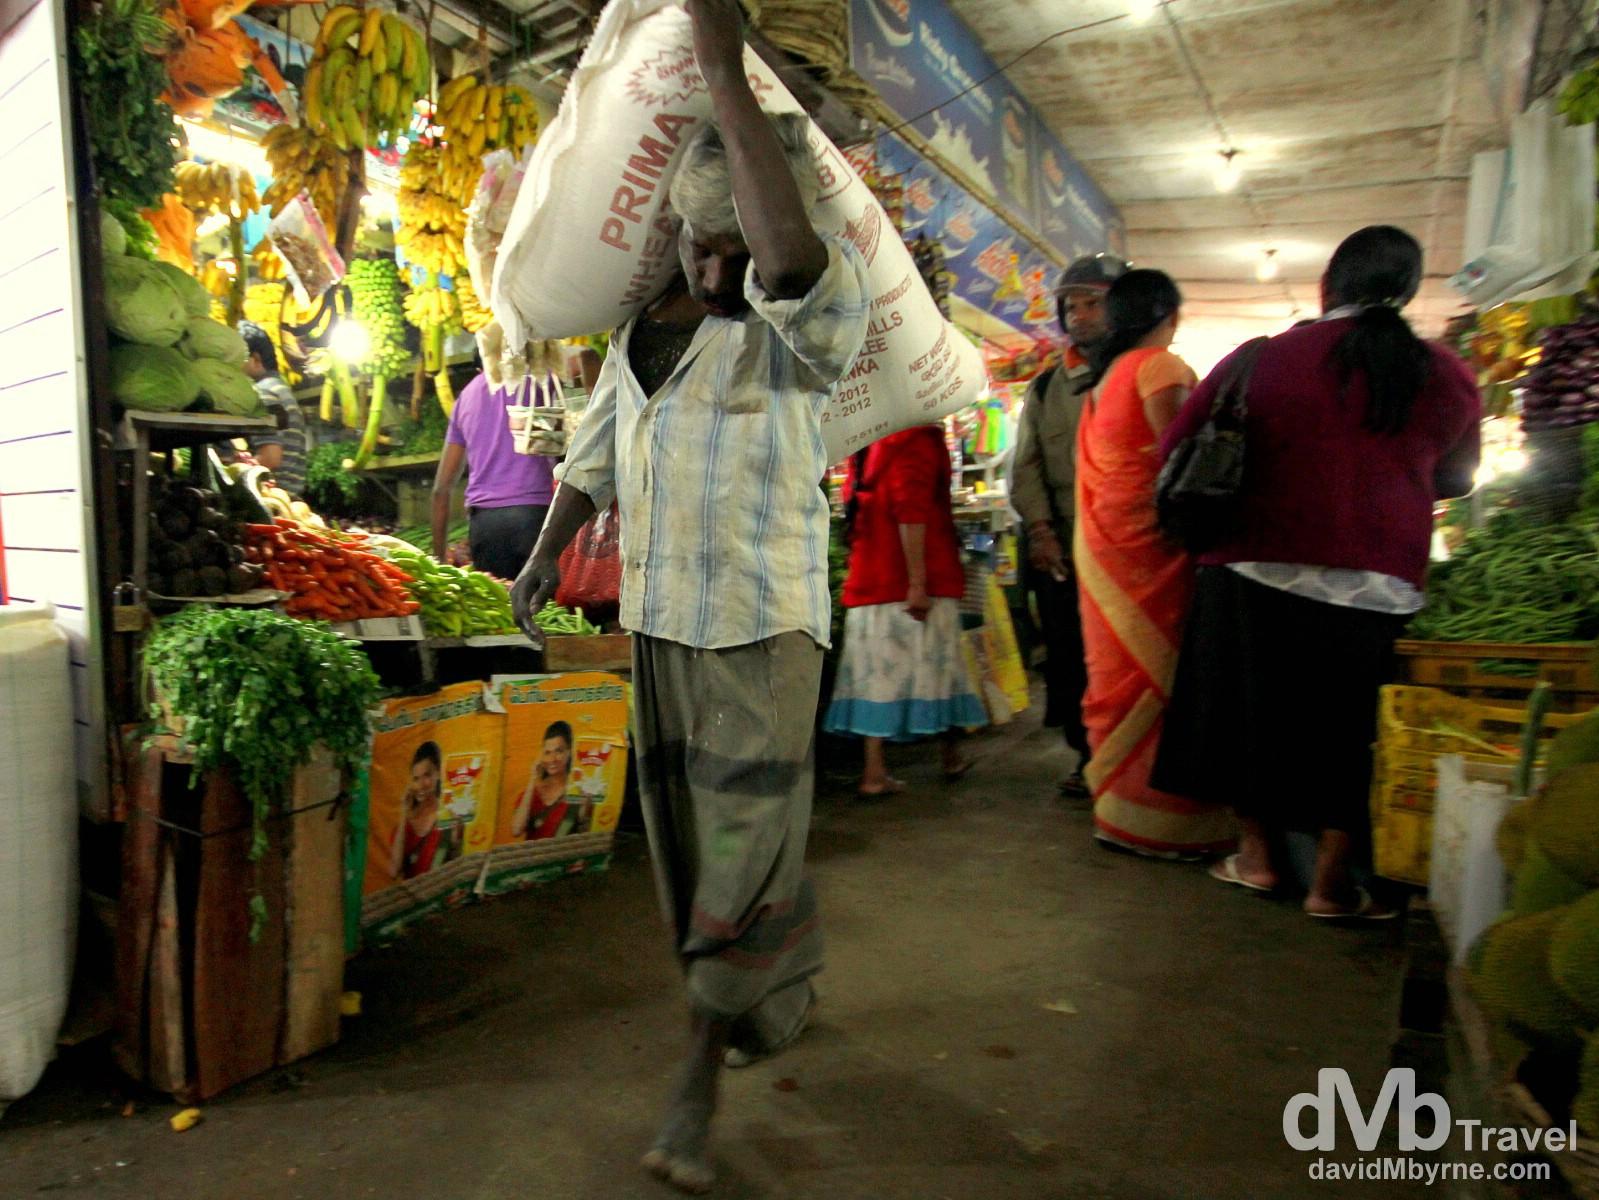 Activity in a produce market in Nuwera Eliya, Sri Lanka. September 6th 2012.